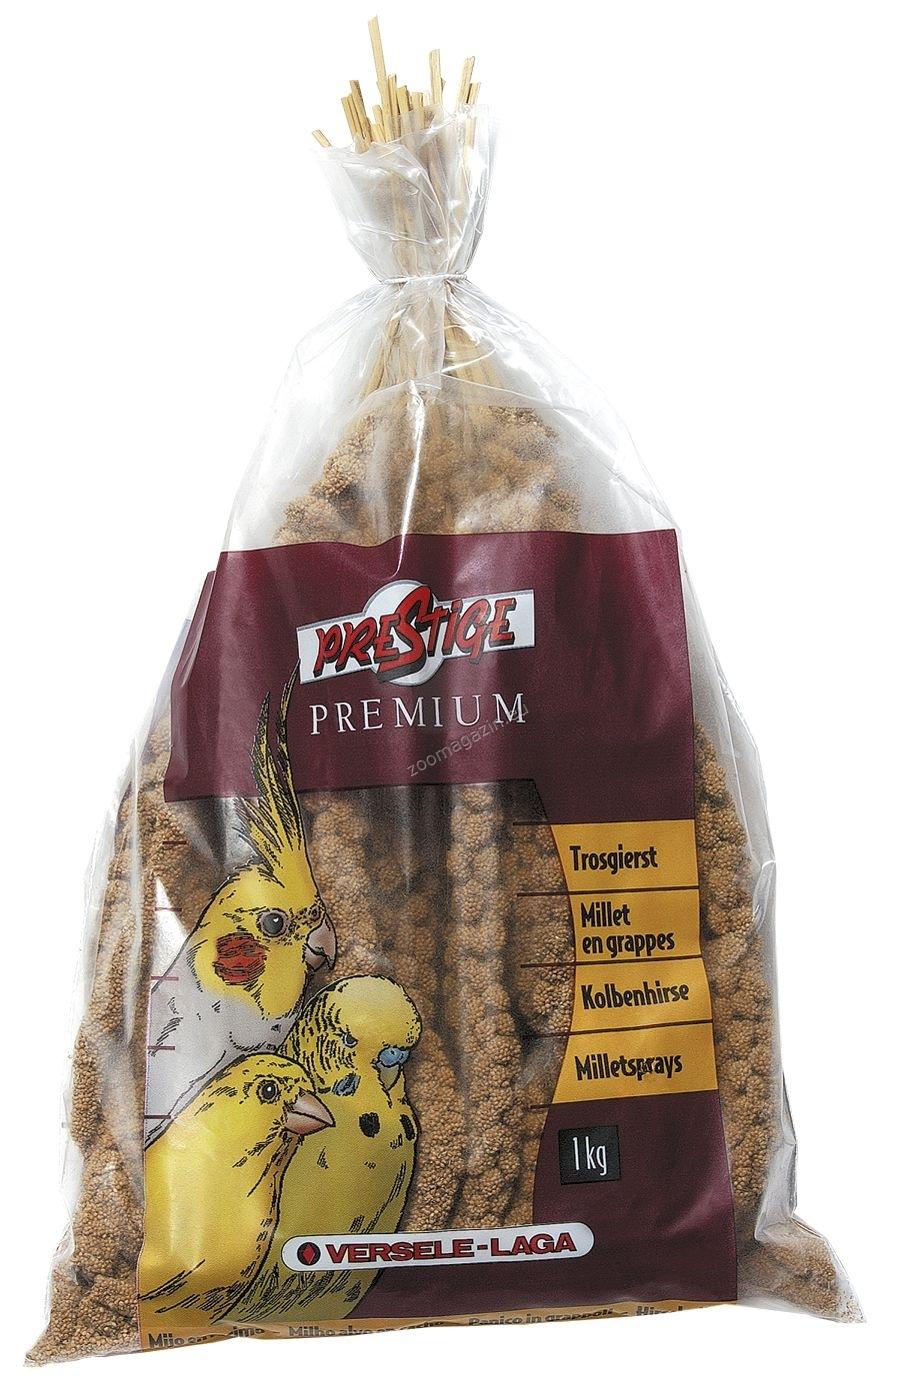 Versele Laga - Premium Prestige Milletsprays - натурално просо (на клас) 300 гр.